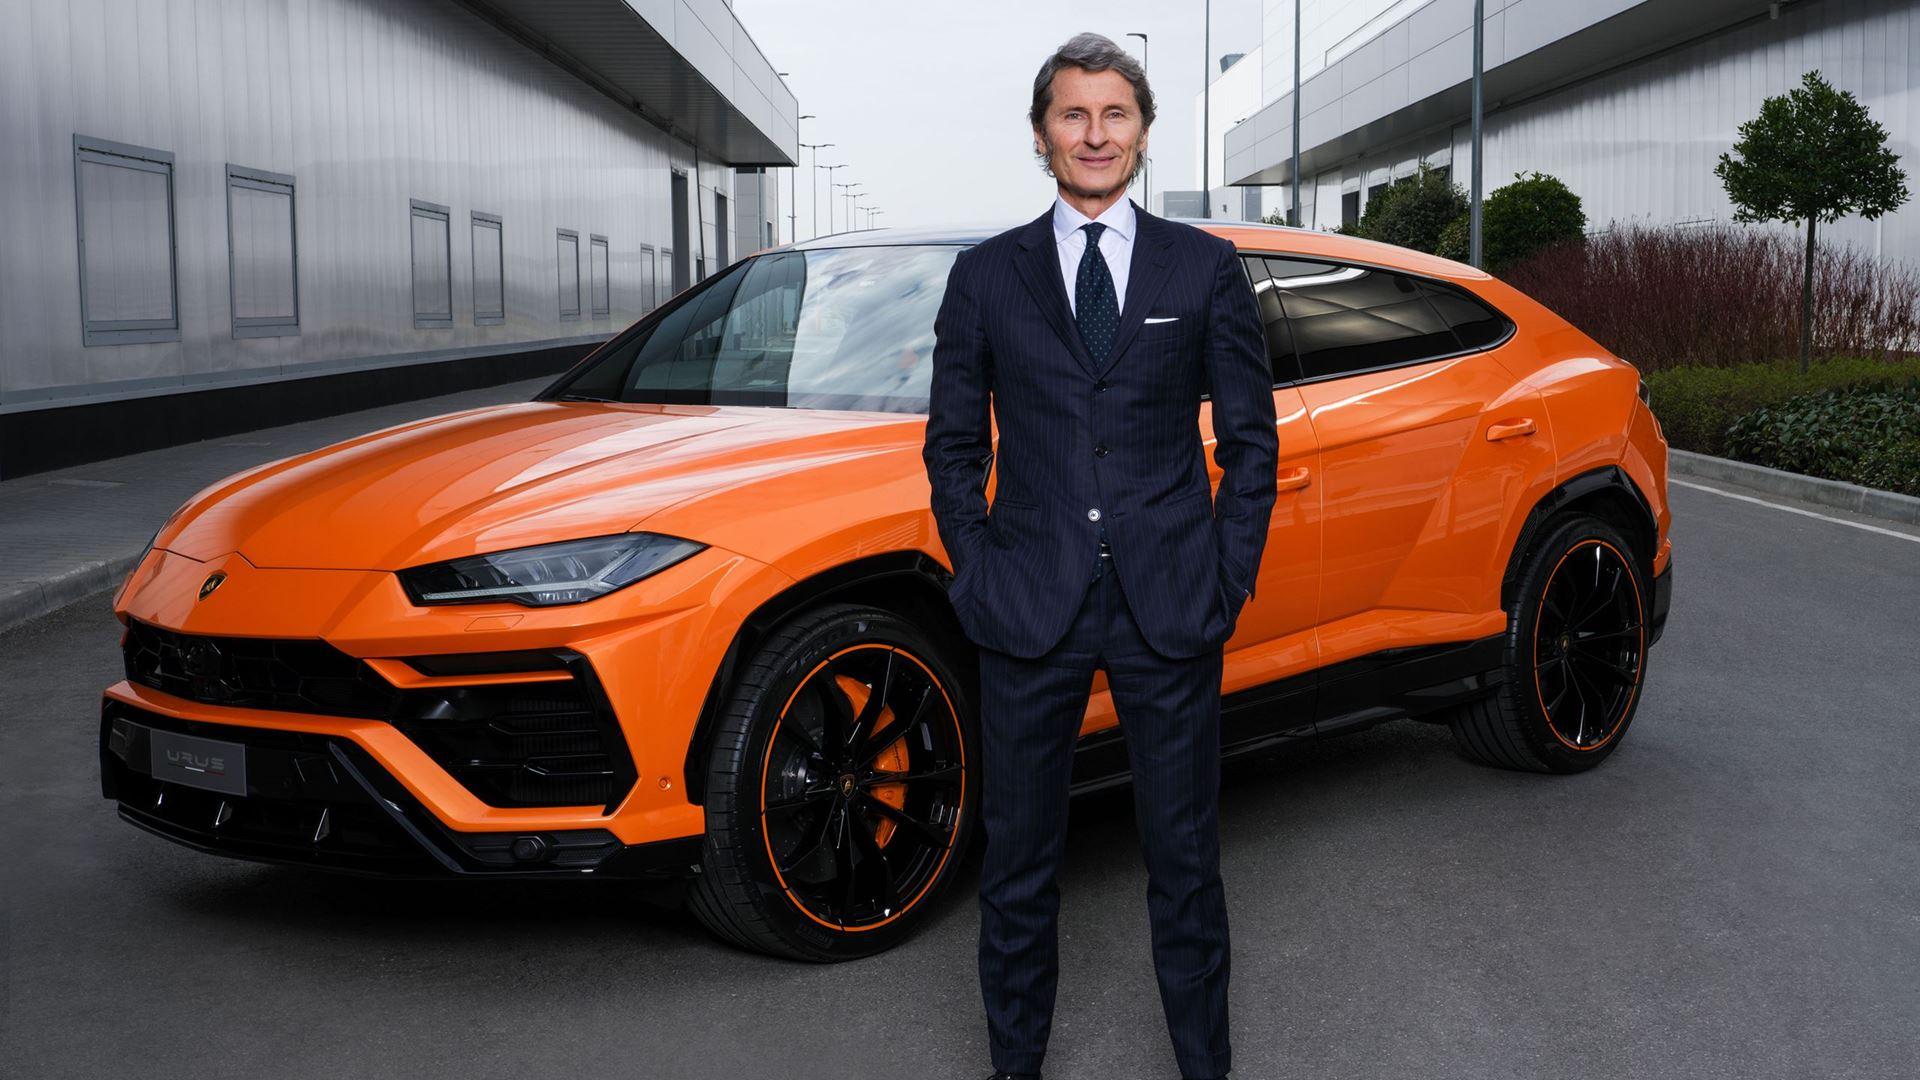 Automobili Lamborghini: sales soaring, record first quarter - Image 8